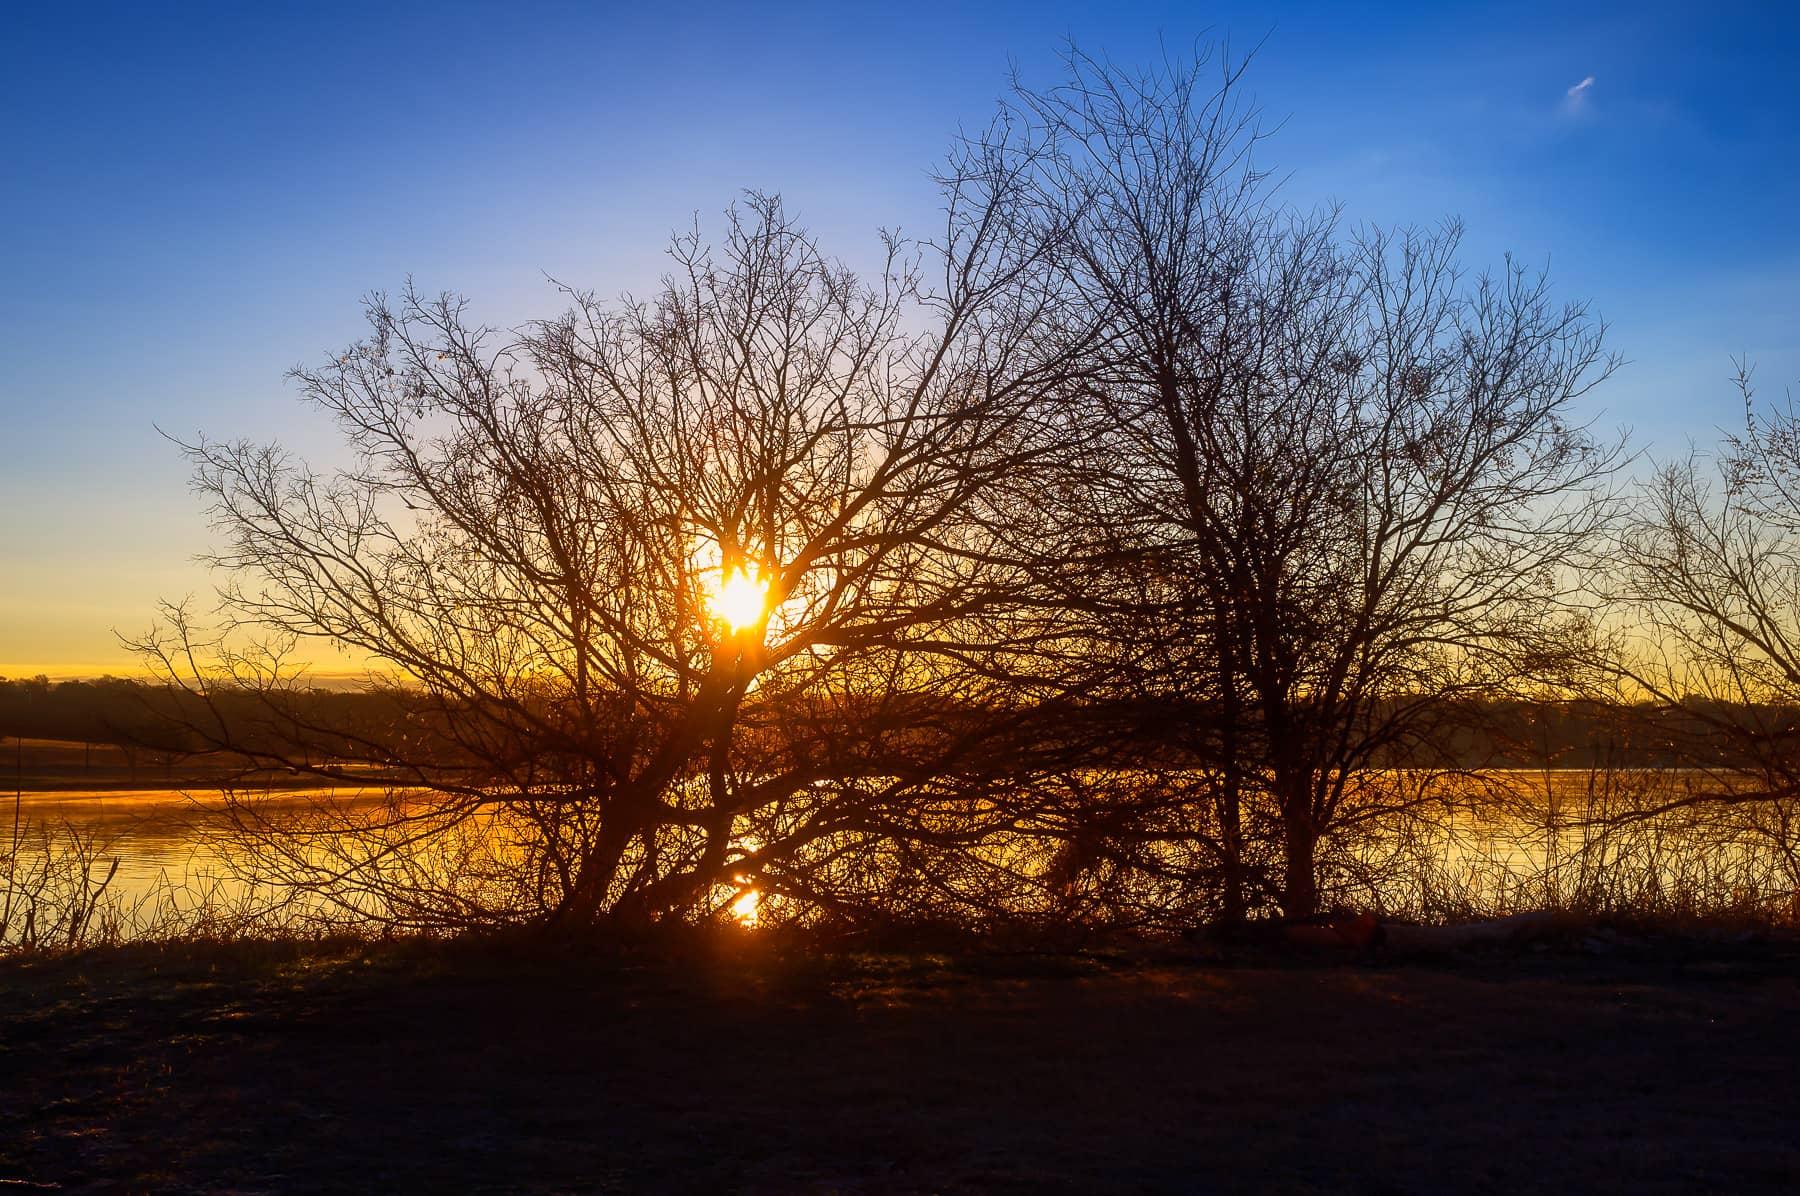 The sun rises over the east shore of Dallas' White Rock Lake.